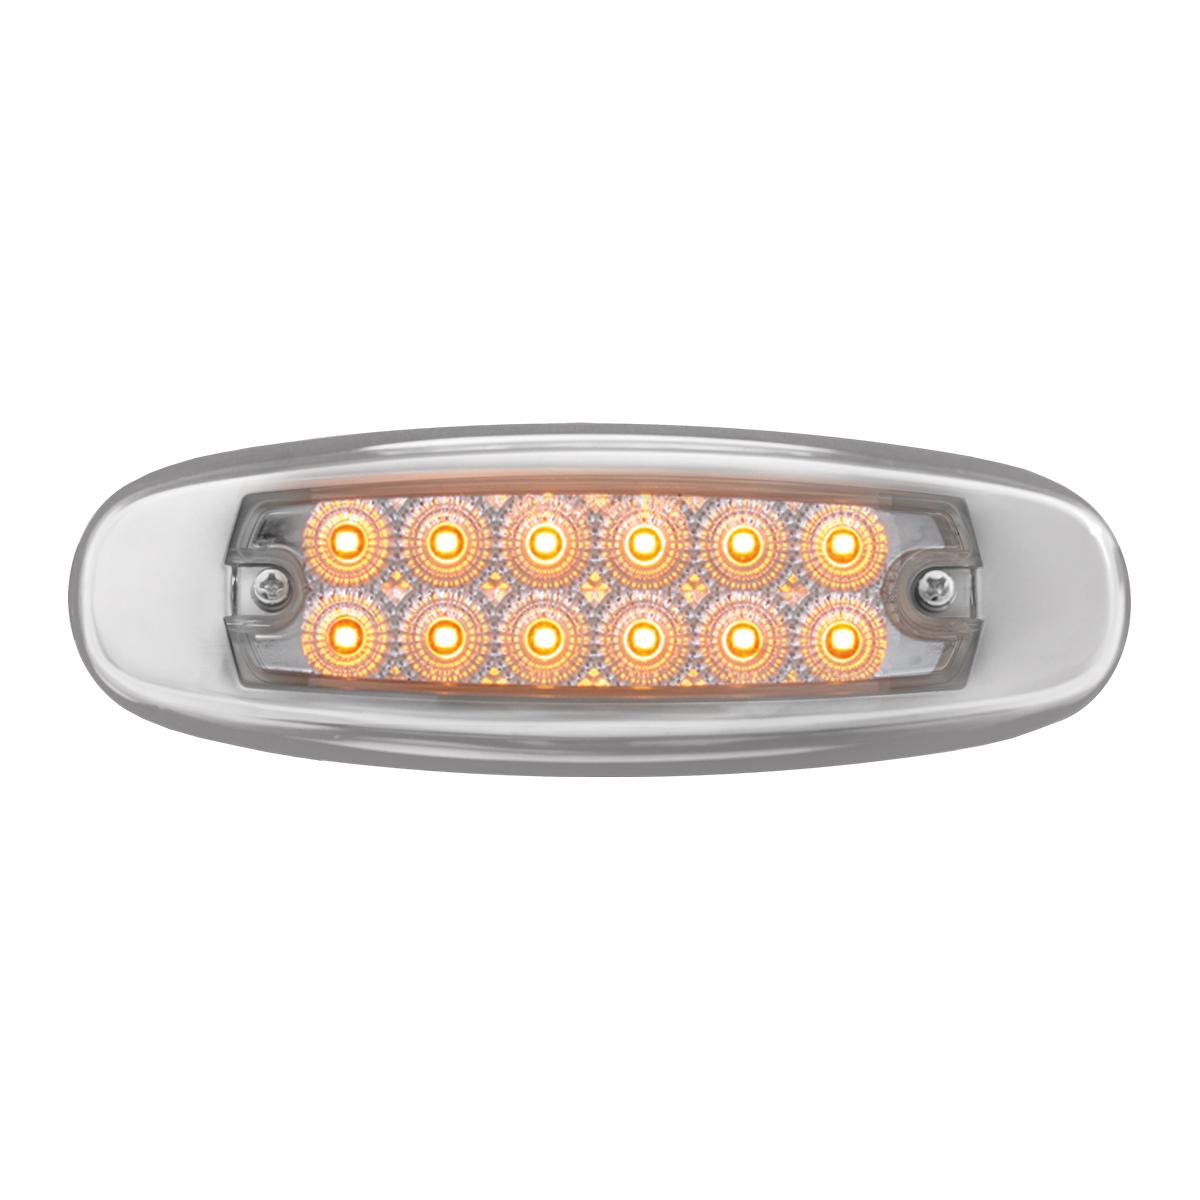 76441 Ultra Thin Dual Function Spyder LED Light w/ Stainless Steel Bezel